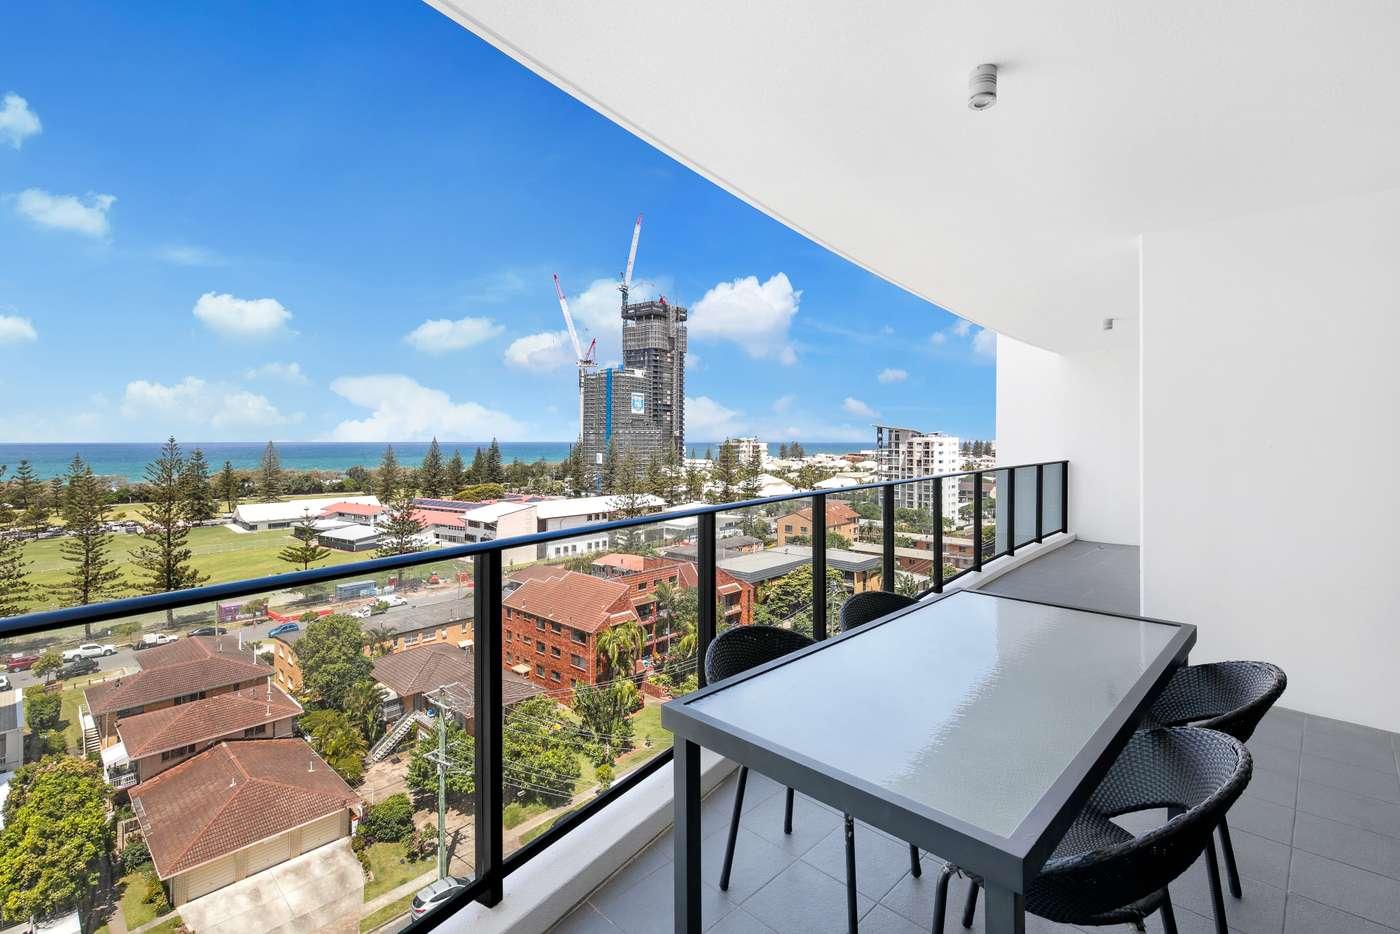 Main view of Homely apartment listing, 1106 'Mantra Sierra Grand' 22 Surf Parade, Broadbeach QLD 4218